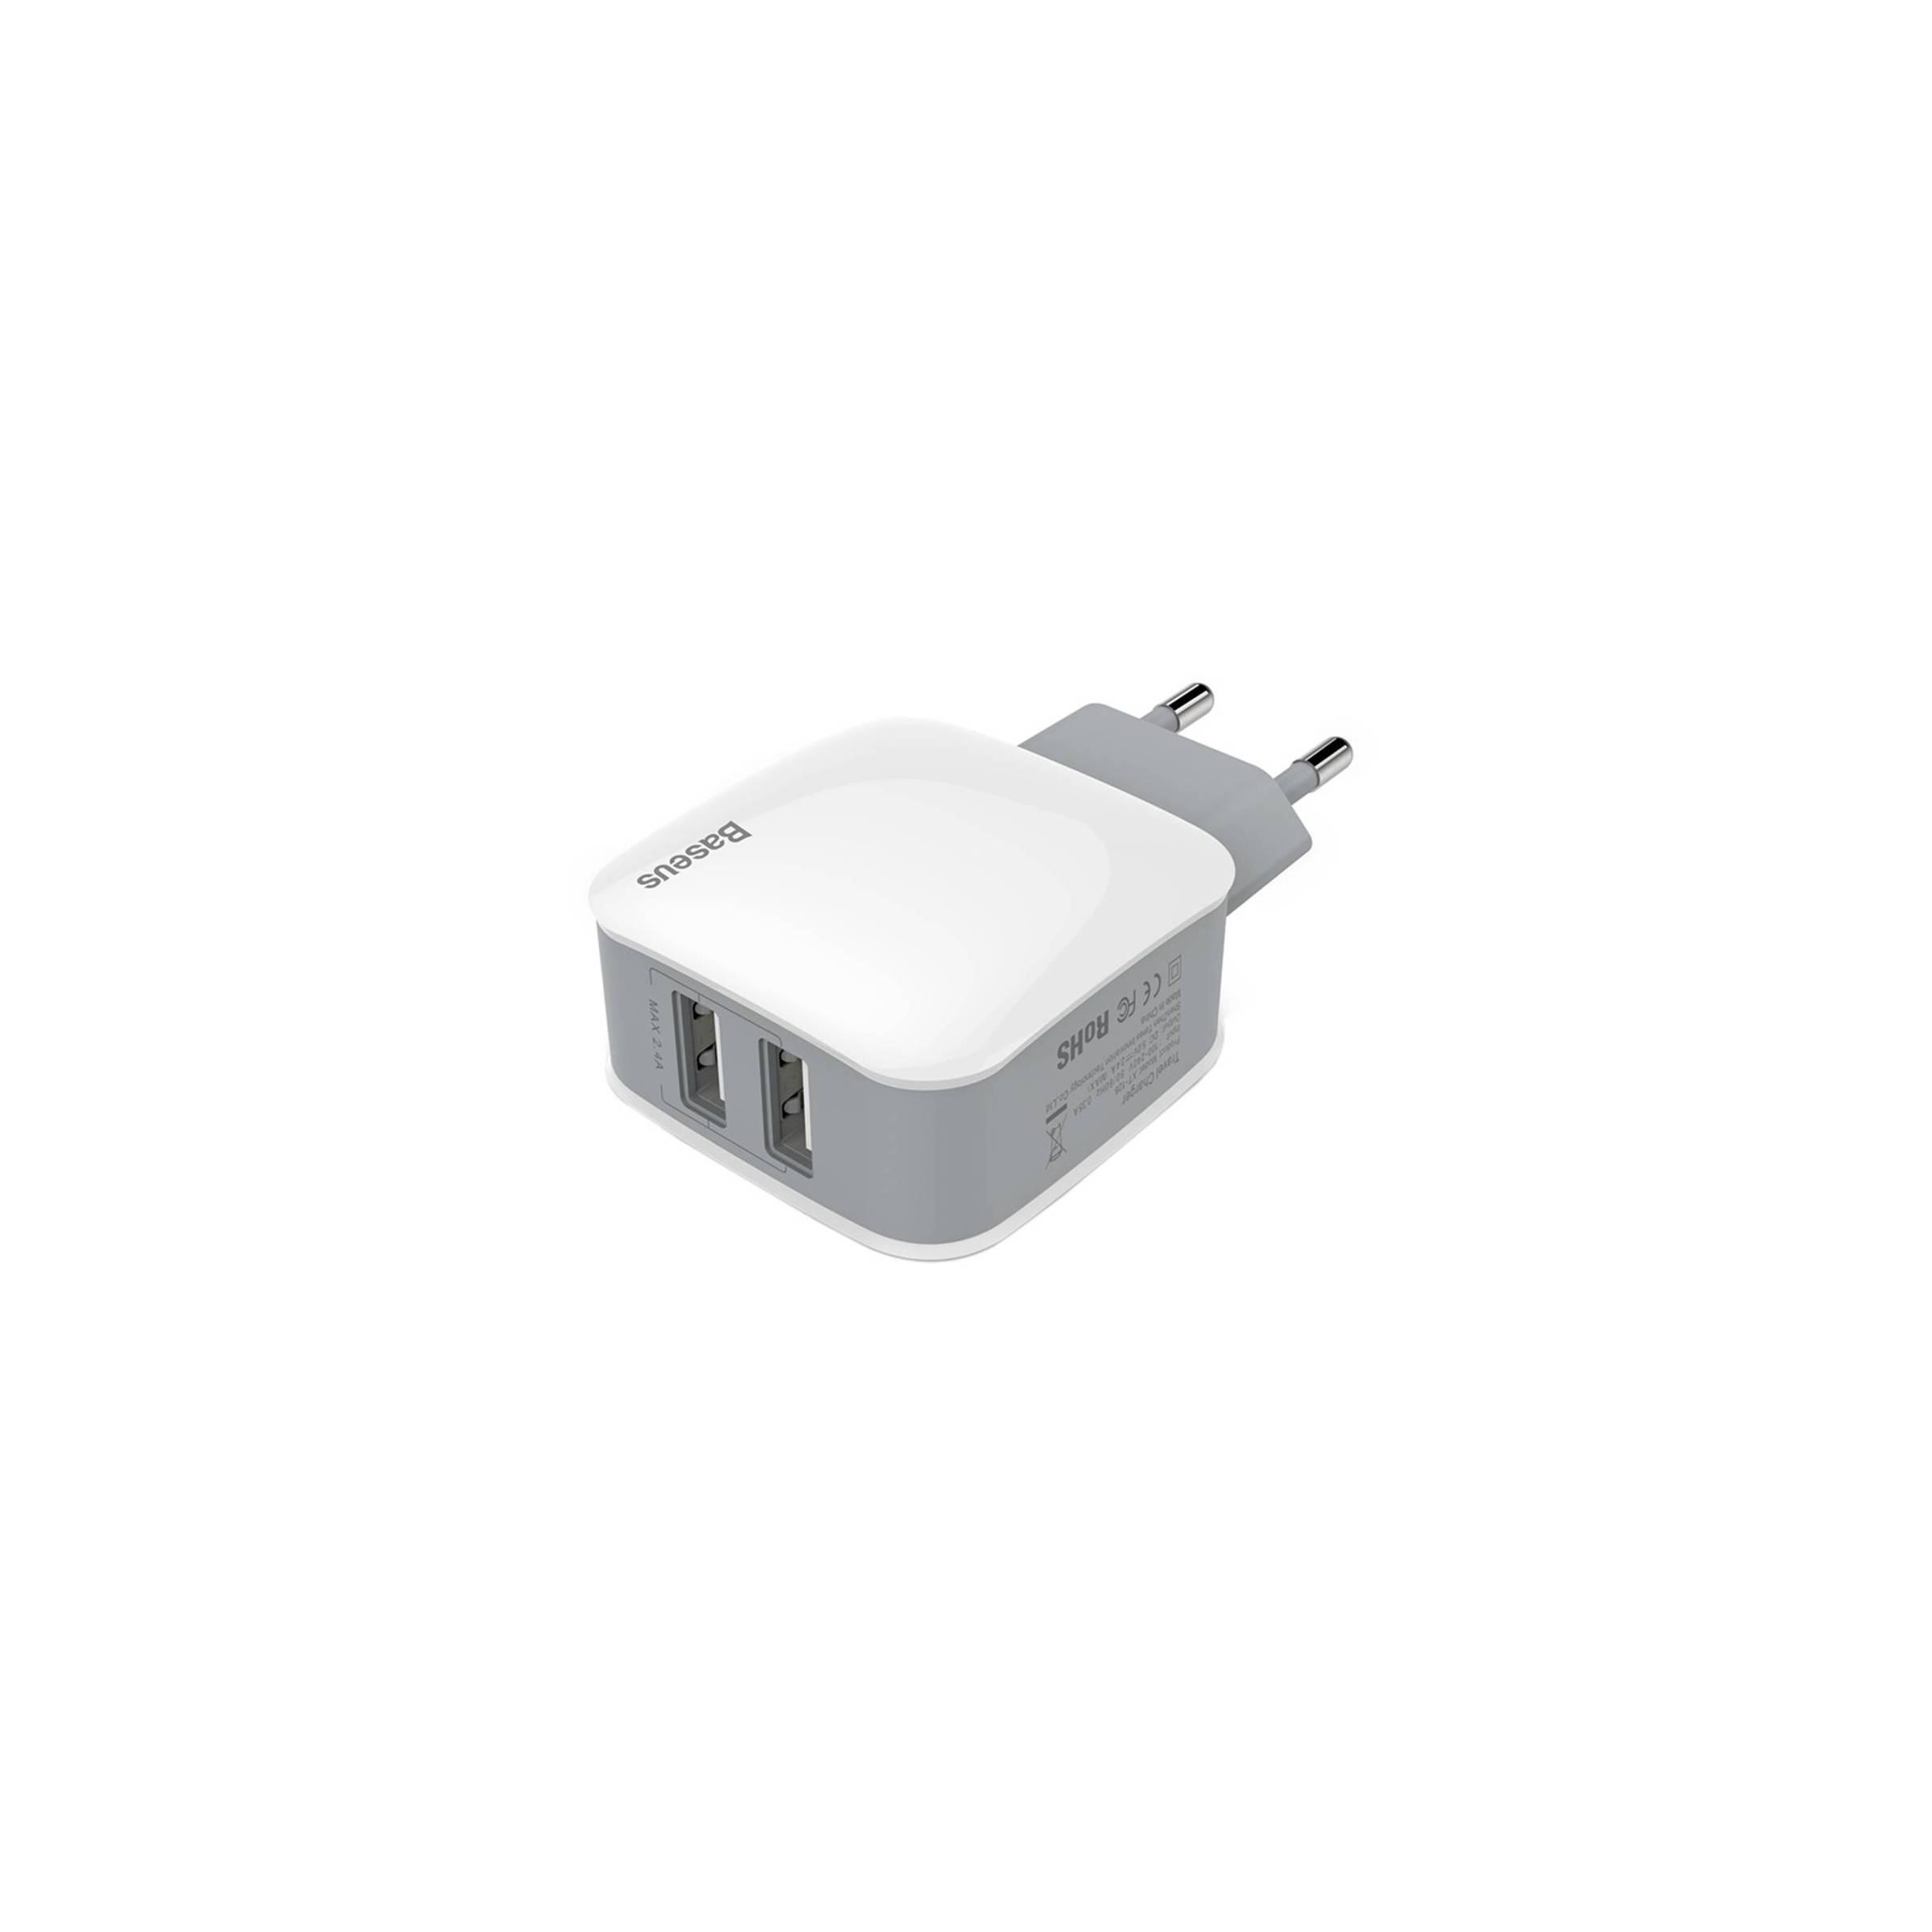 baseus Baseus iphone/ipad usb oplader 2.4a x2 (12w) på mackabler.dk